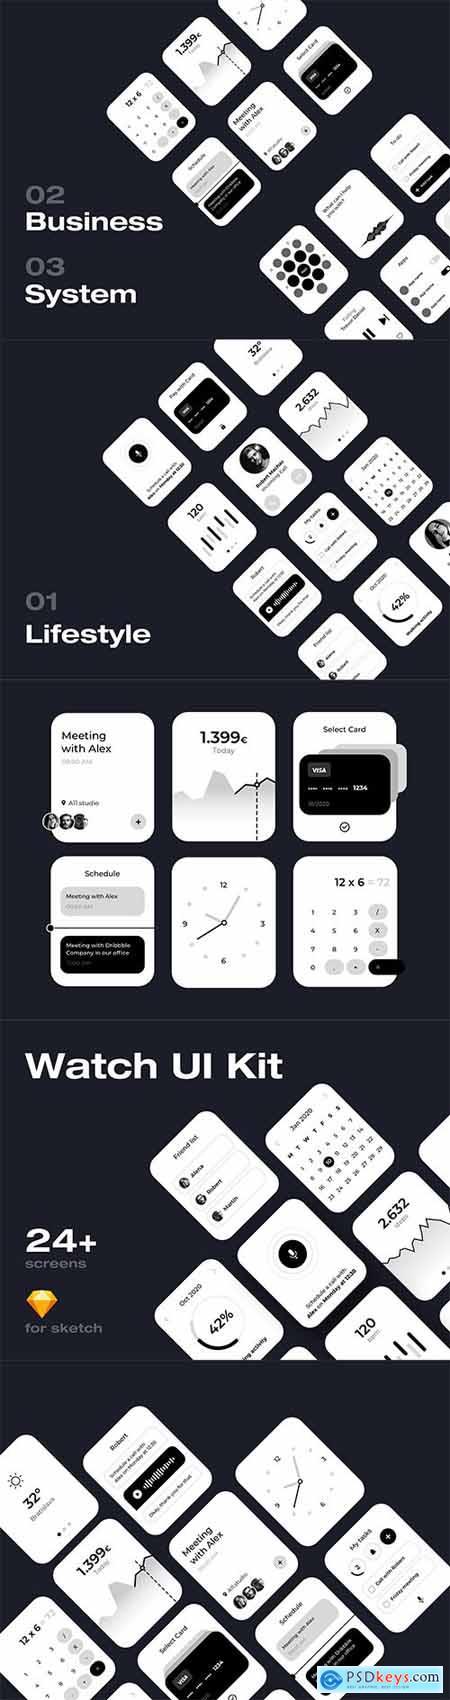 Apple Watch UI Kit